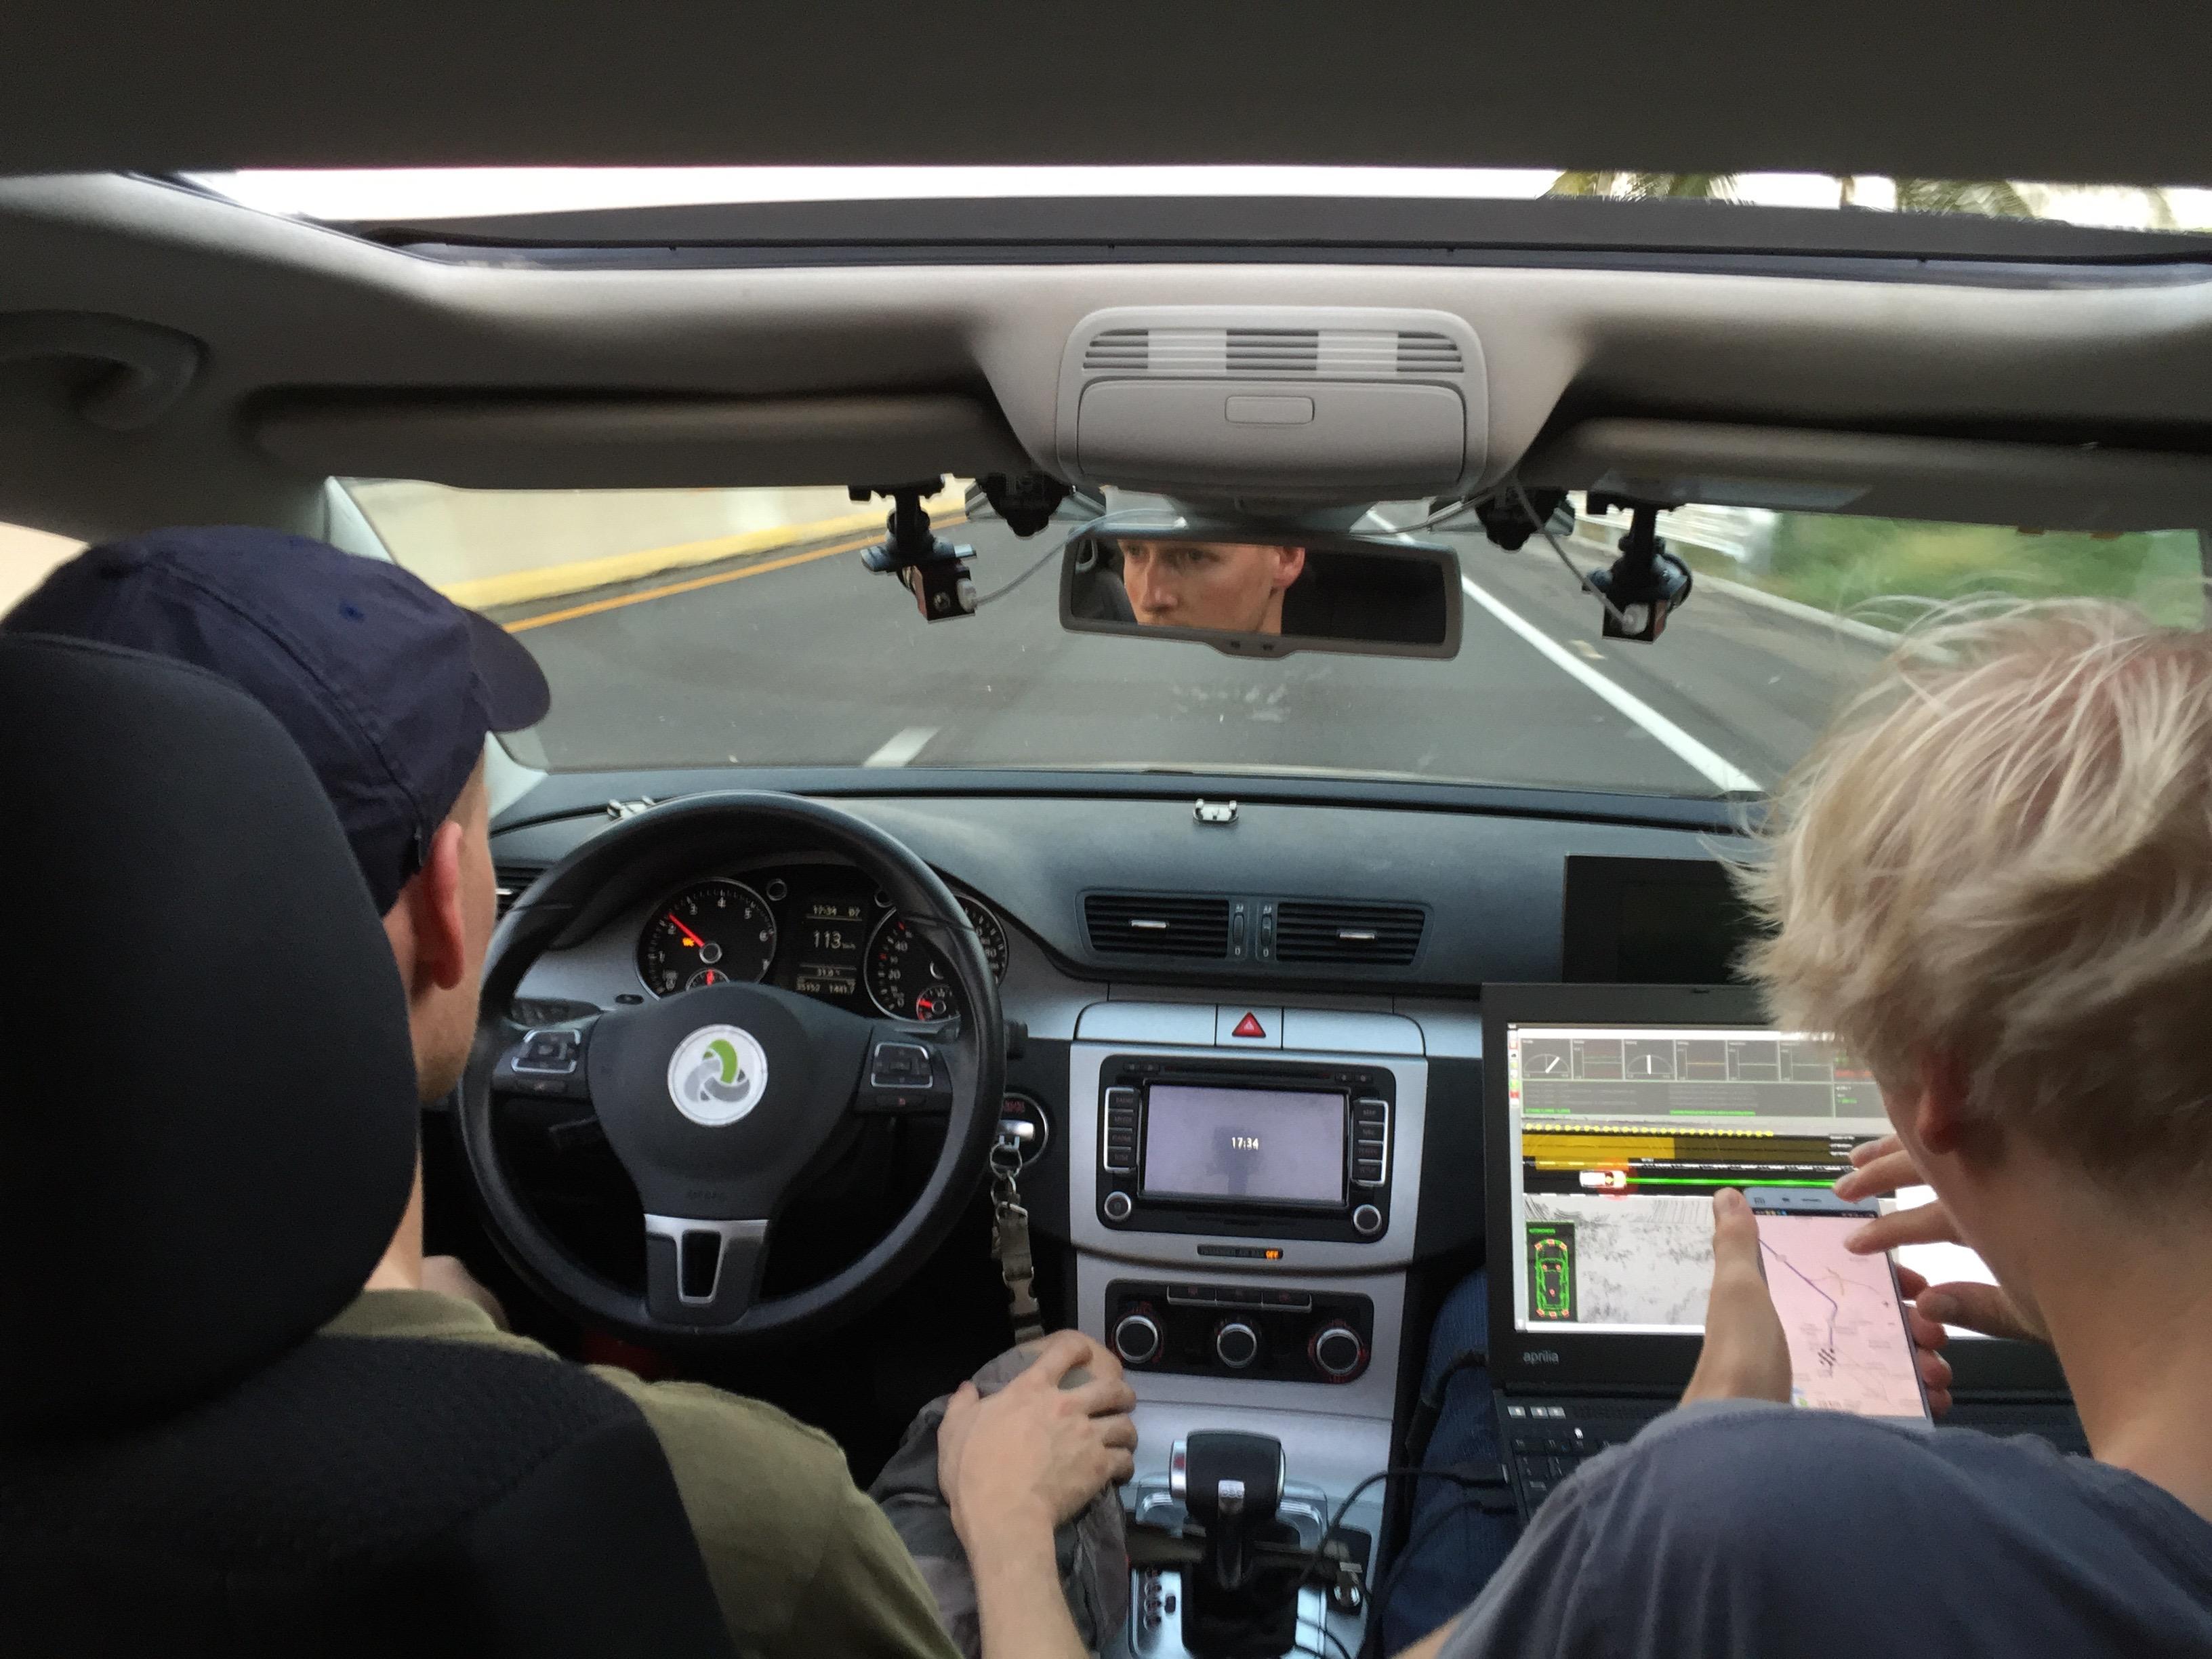 Autonomos Cockpitview